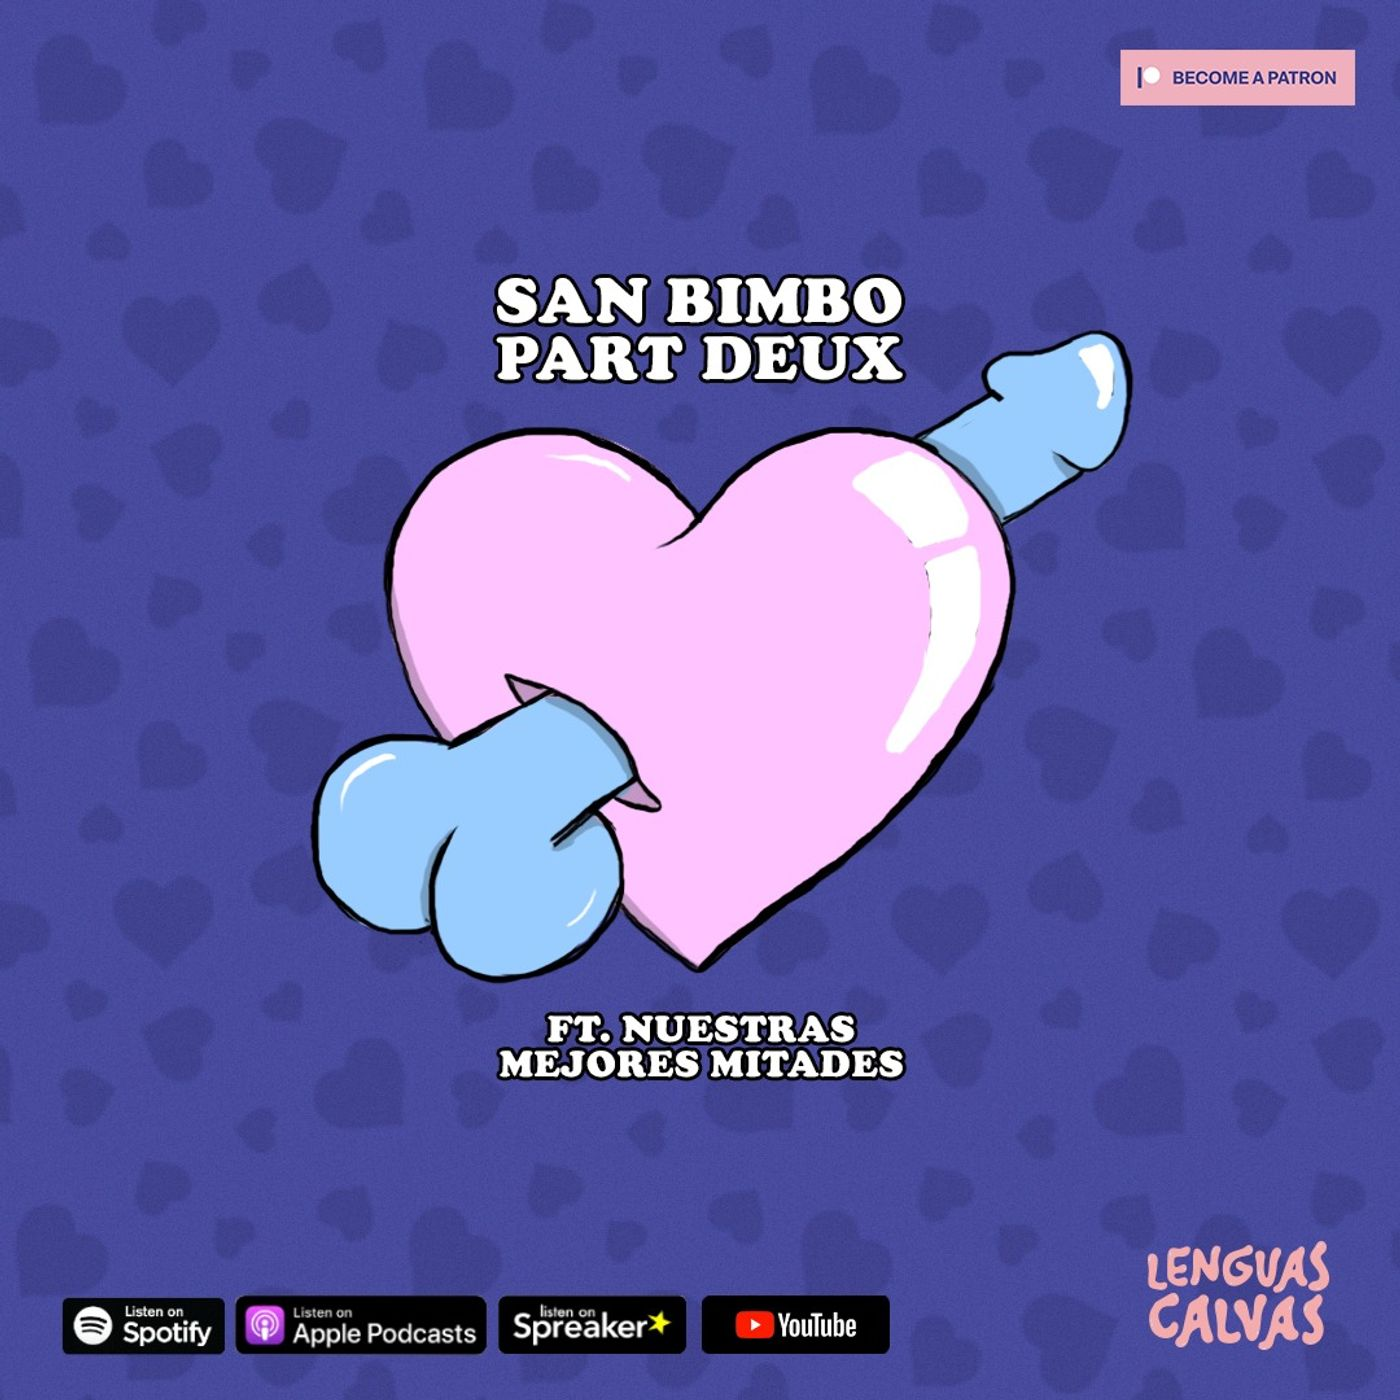 San Bimbo Part Deux